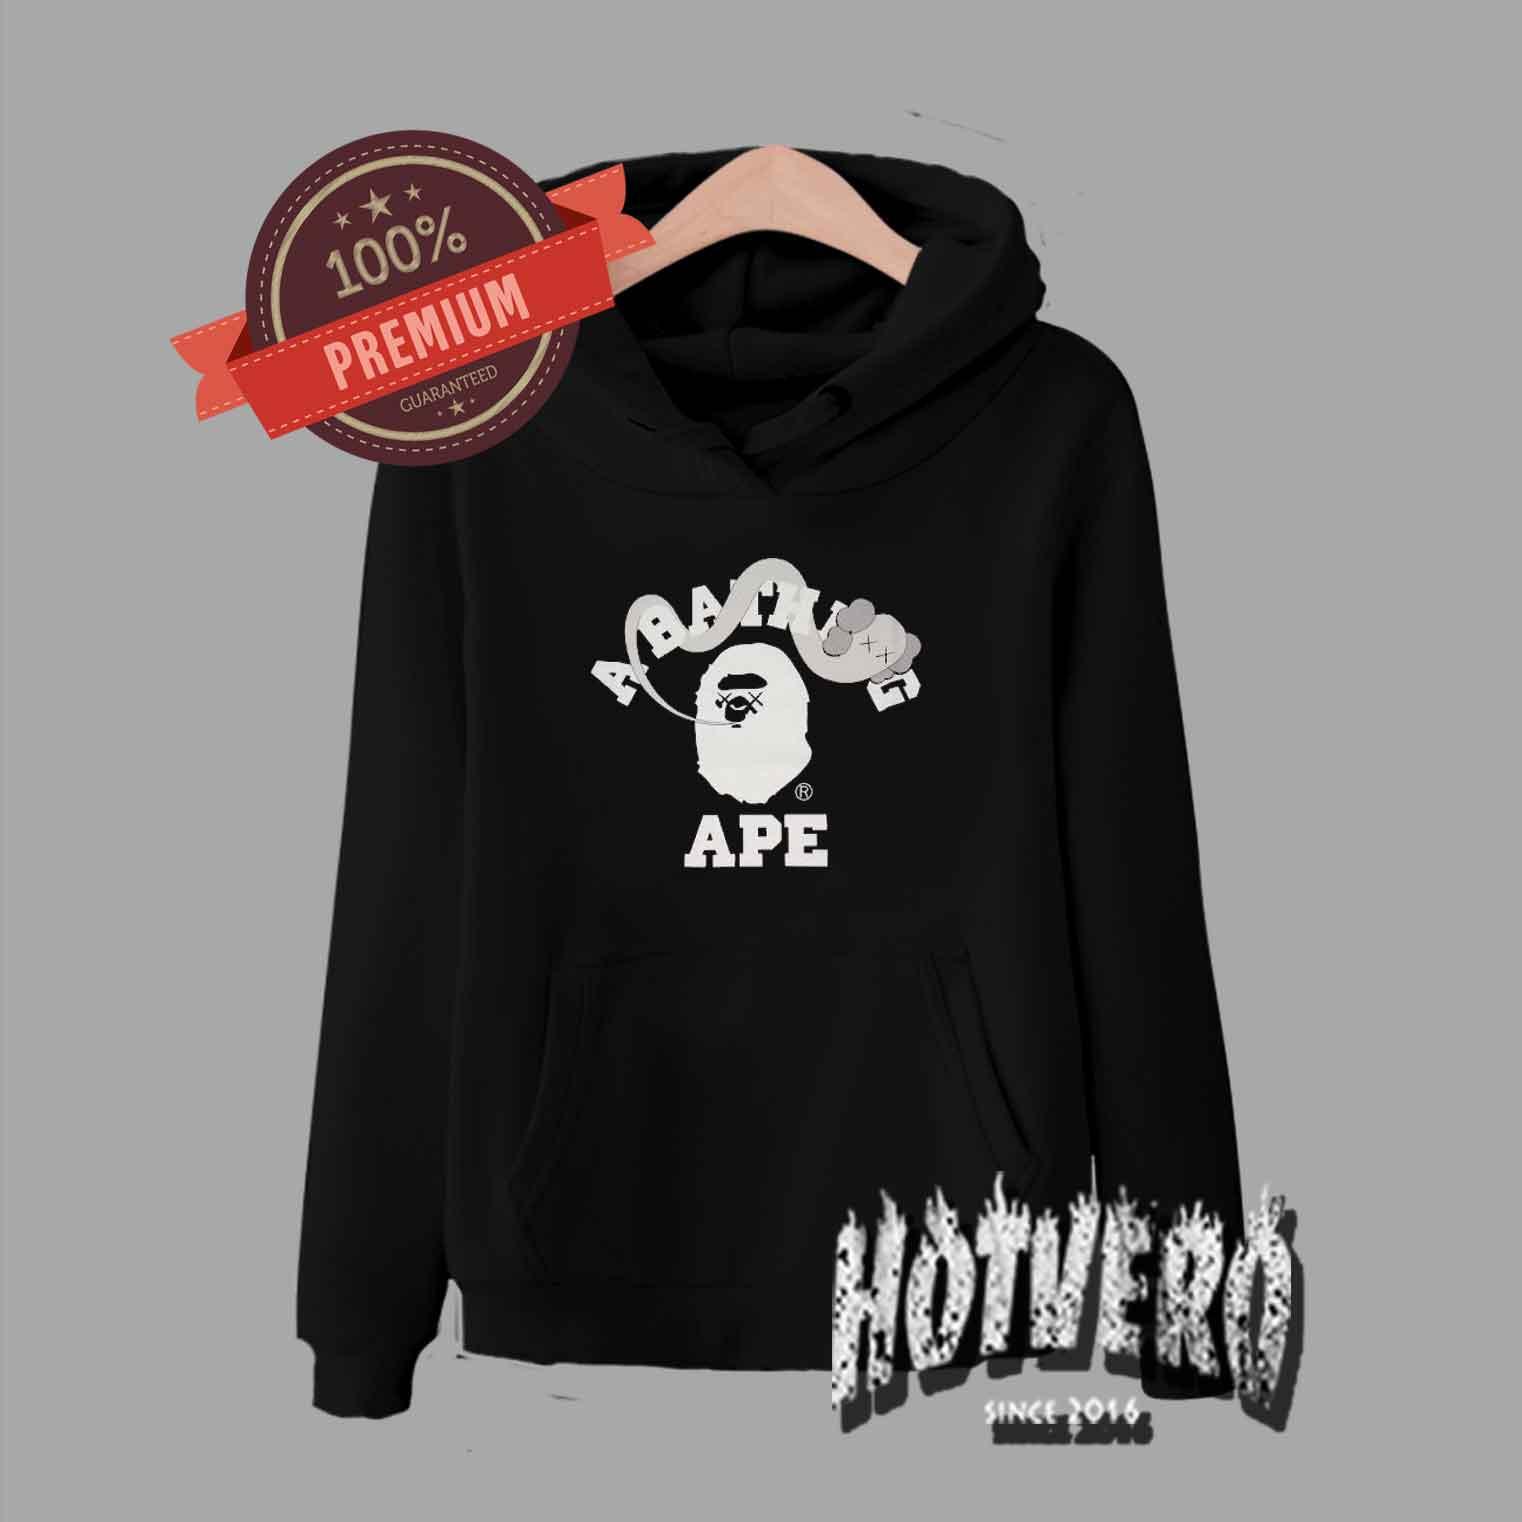 Bape X Kaws >> Bape X Kaws Pullover Hoodie Urban Fashion Collaboration Hotvero Com